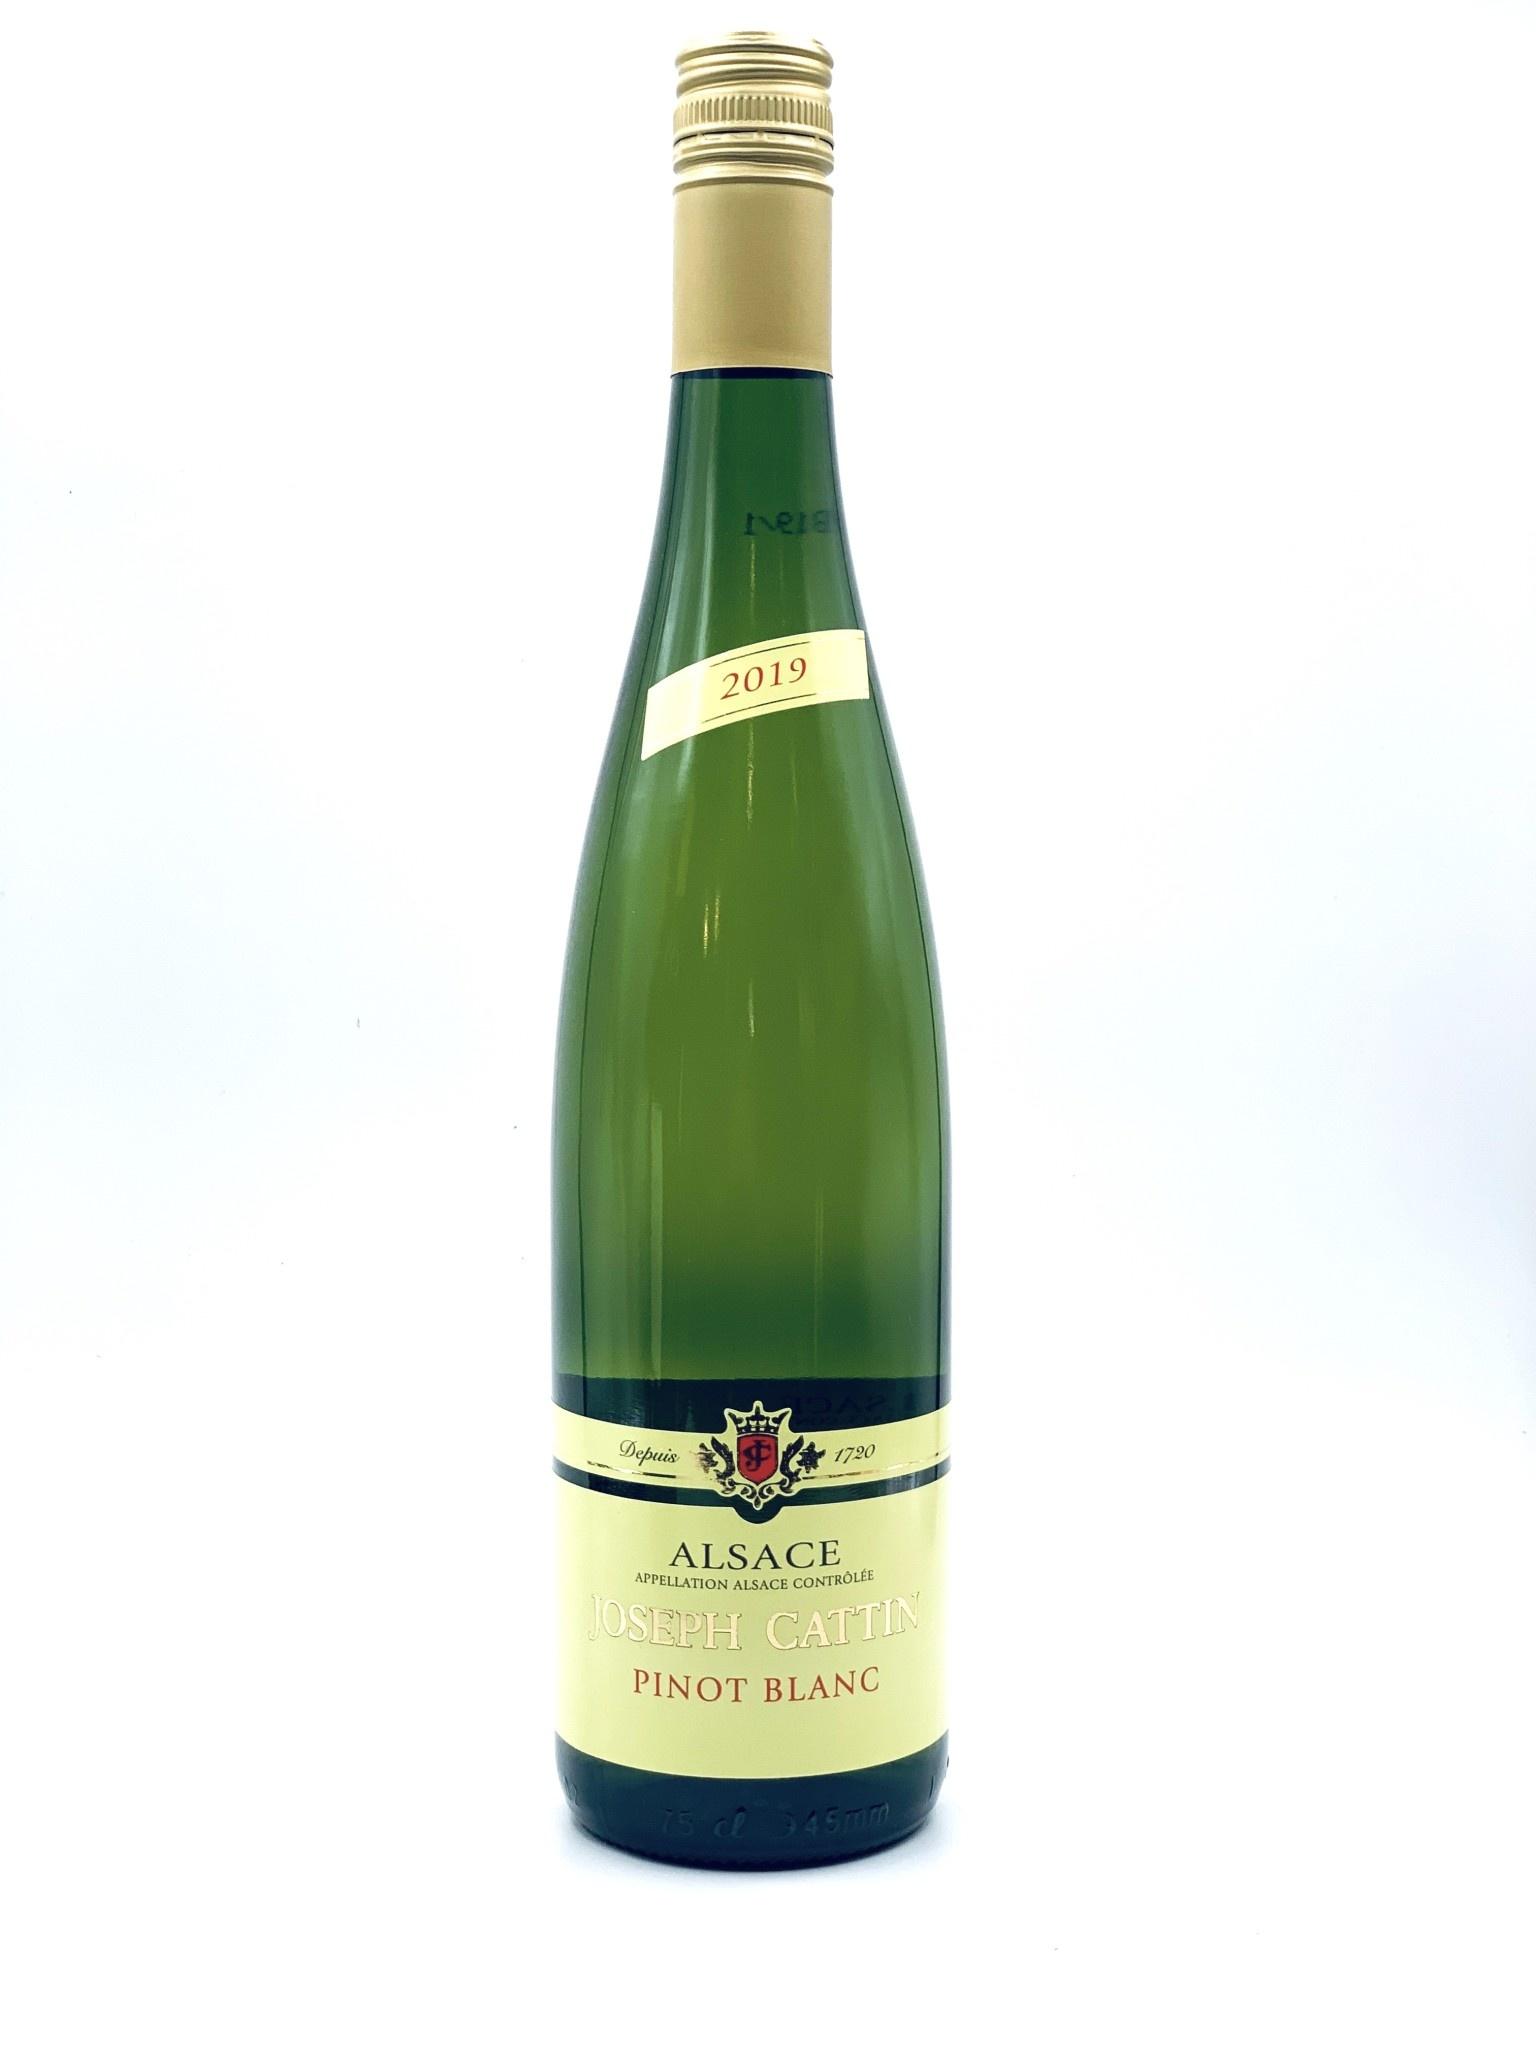 Alsace Pinot Blanc 2019 Joseph Cattin